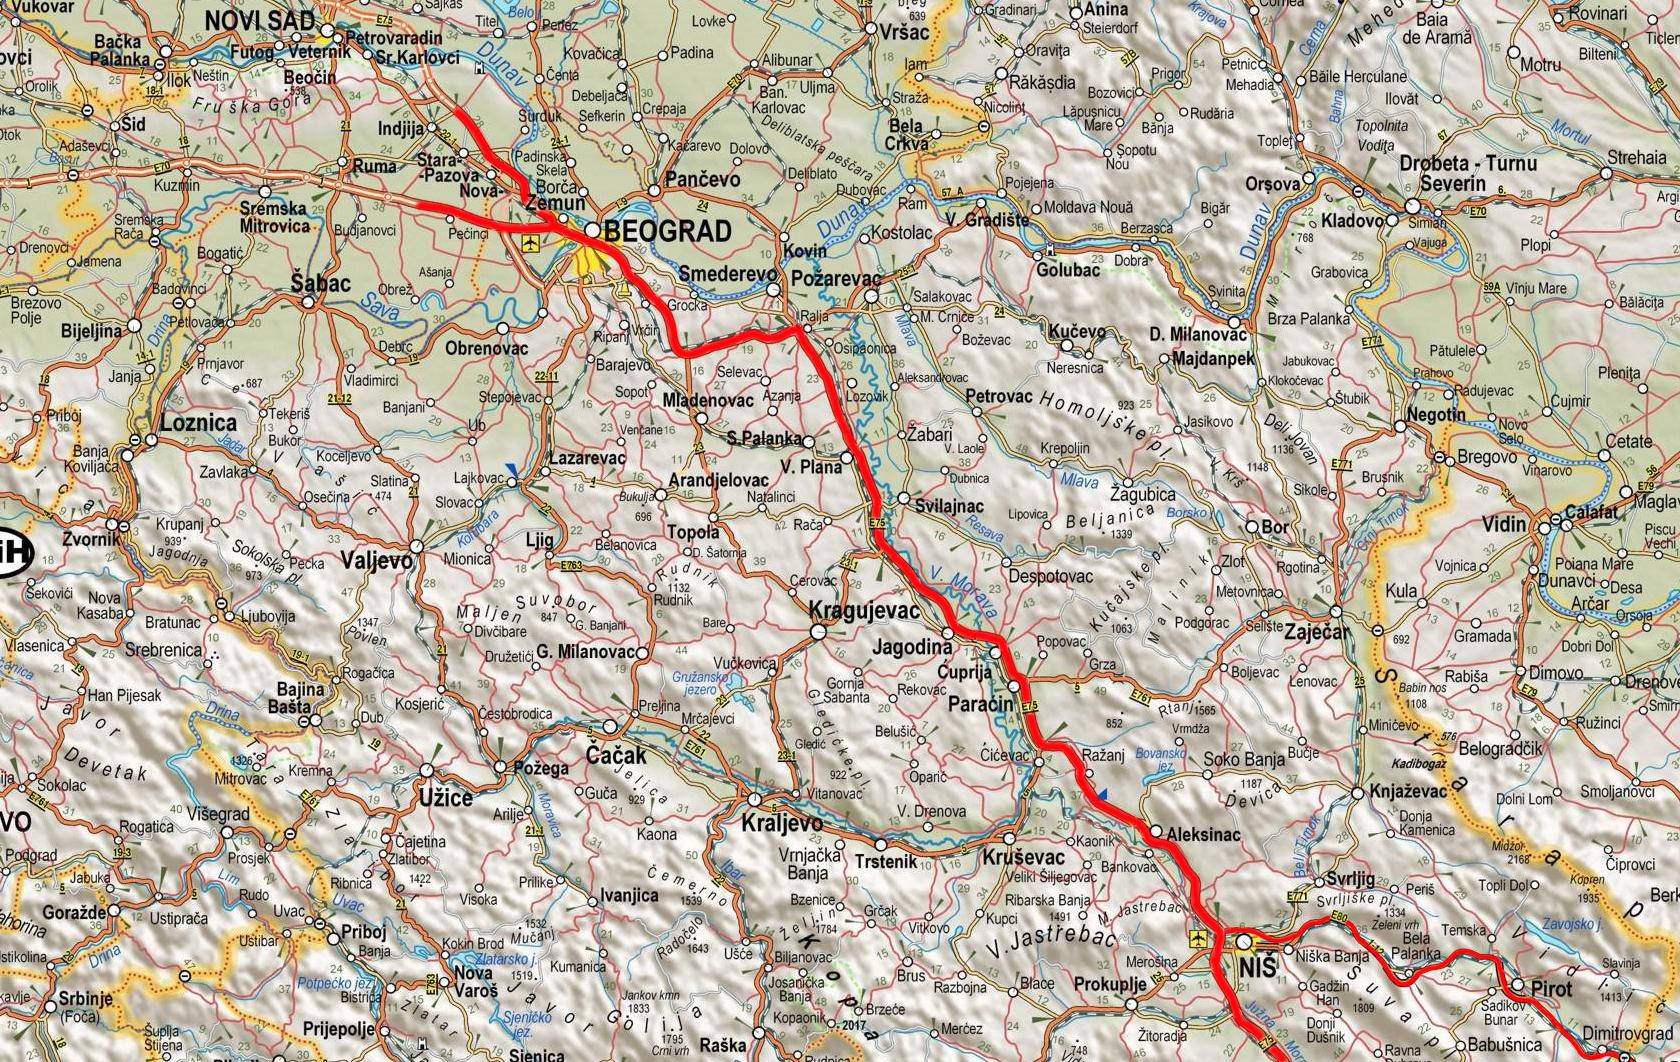 mapa srbije nis Omladinac elektro | Contact mapa srbije nis